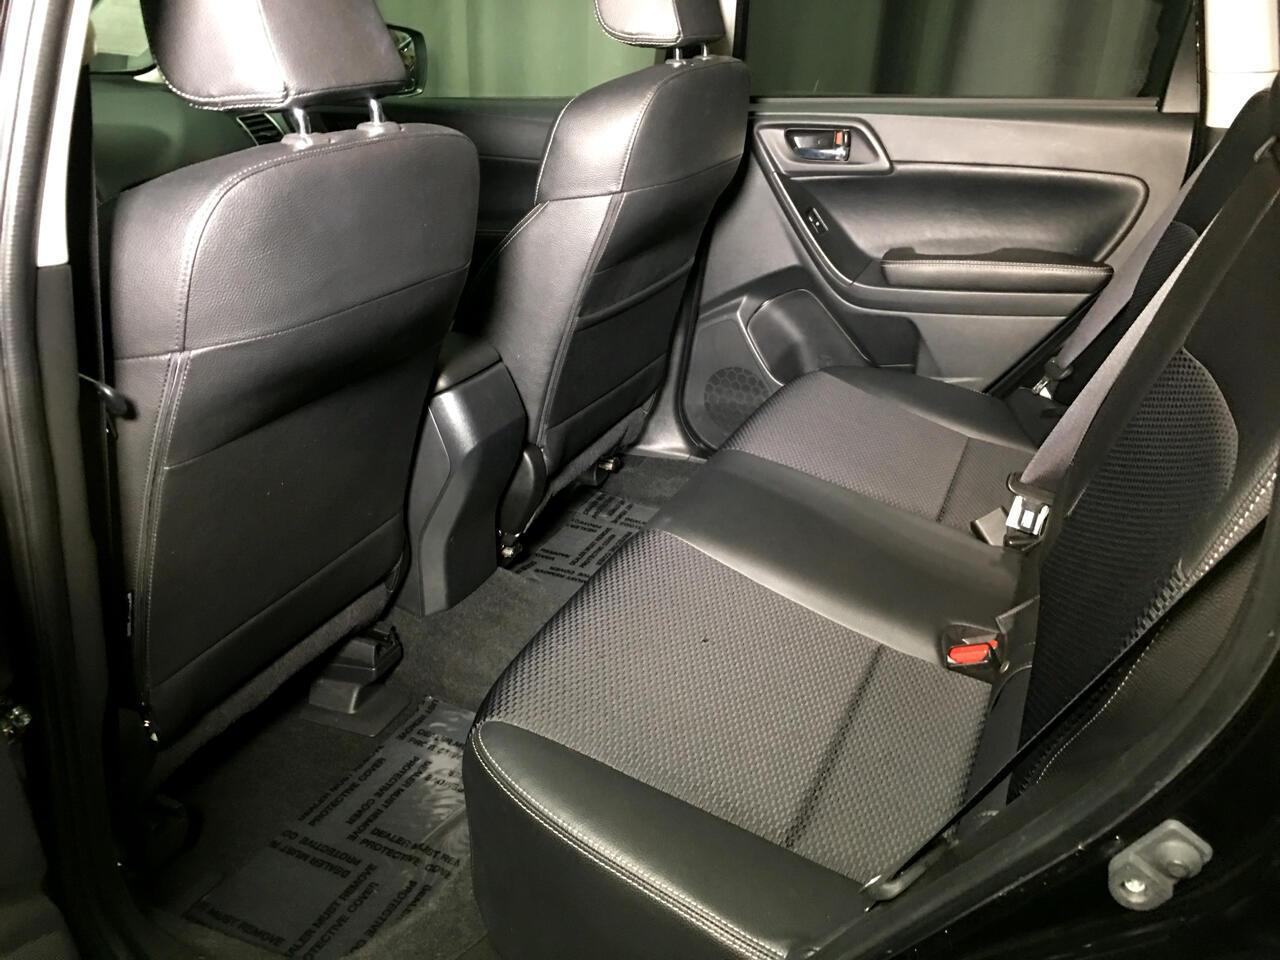 Pre-Owned 2016 Subaru Forester 4dr CVT 2.0XT Premium